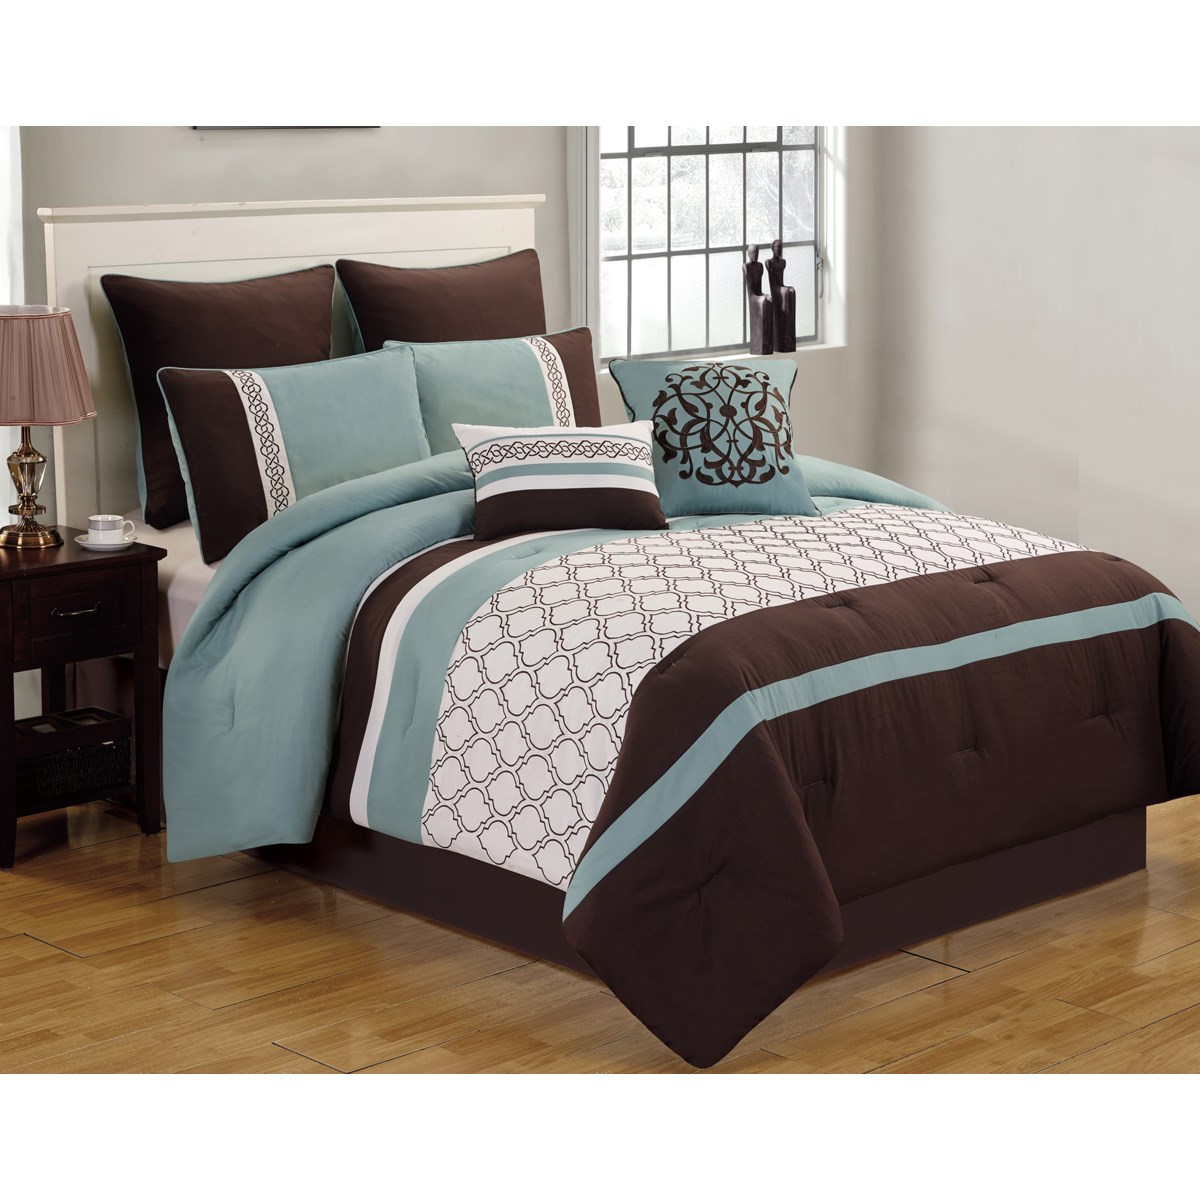 Teagan 8pc Queen Comforter Set